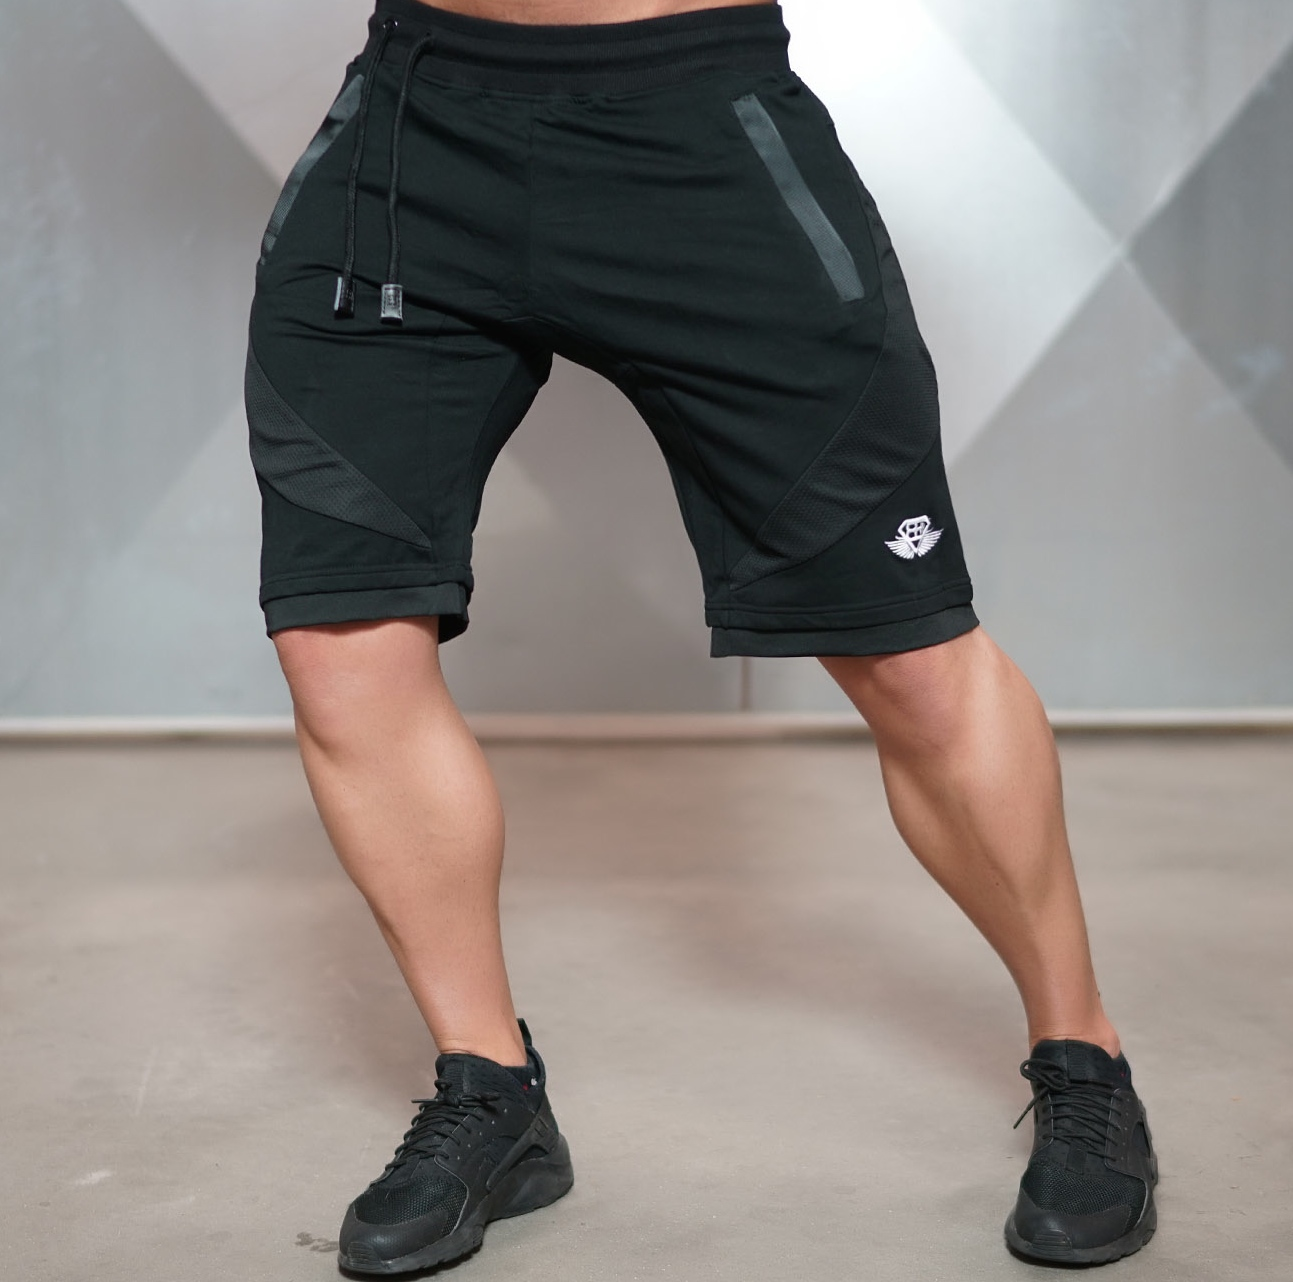 Body Engineers - Sportovní kraťasy pánské YUREI (černá) dfb214c069